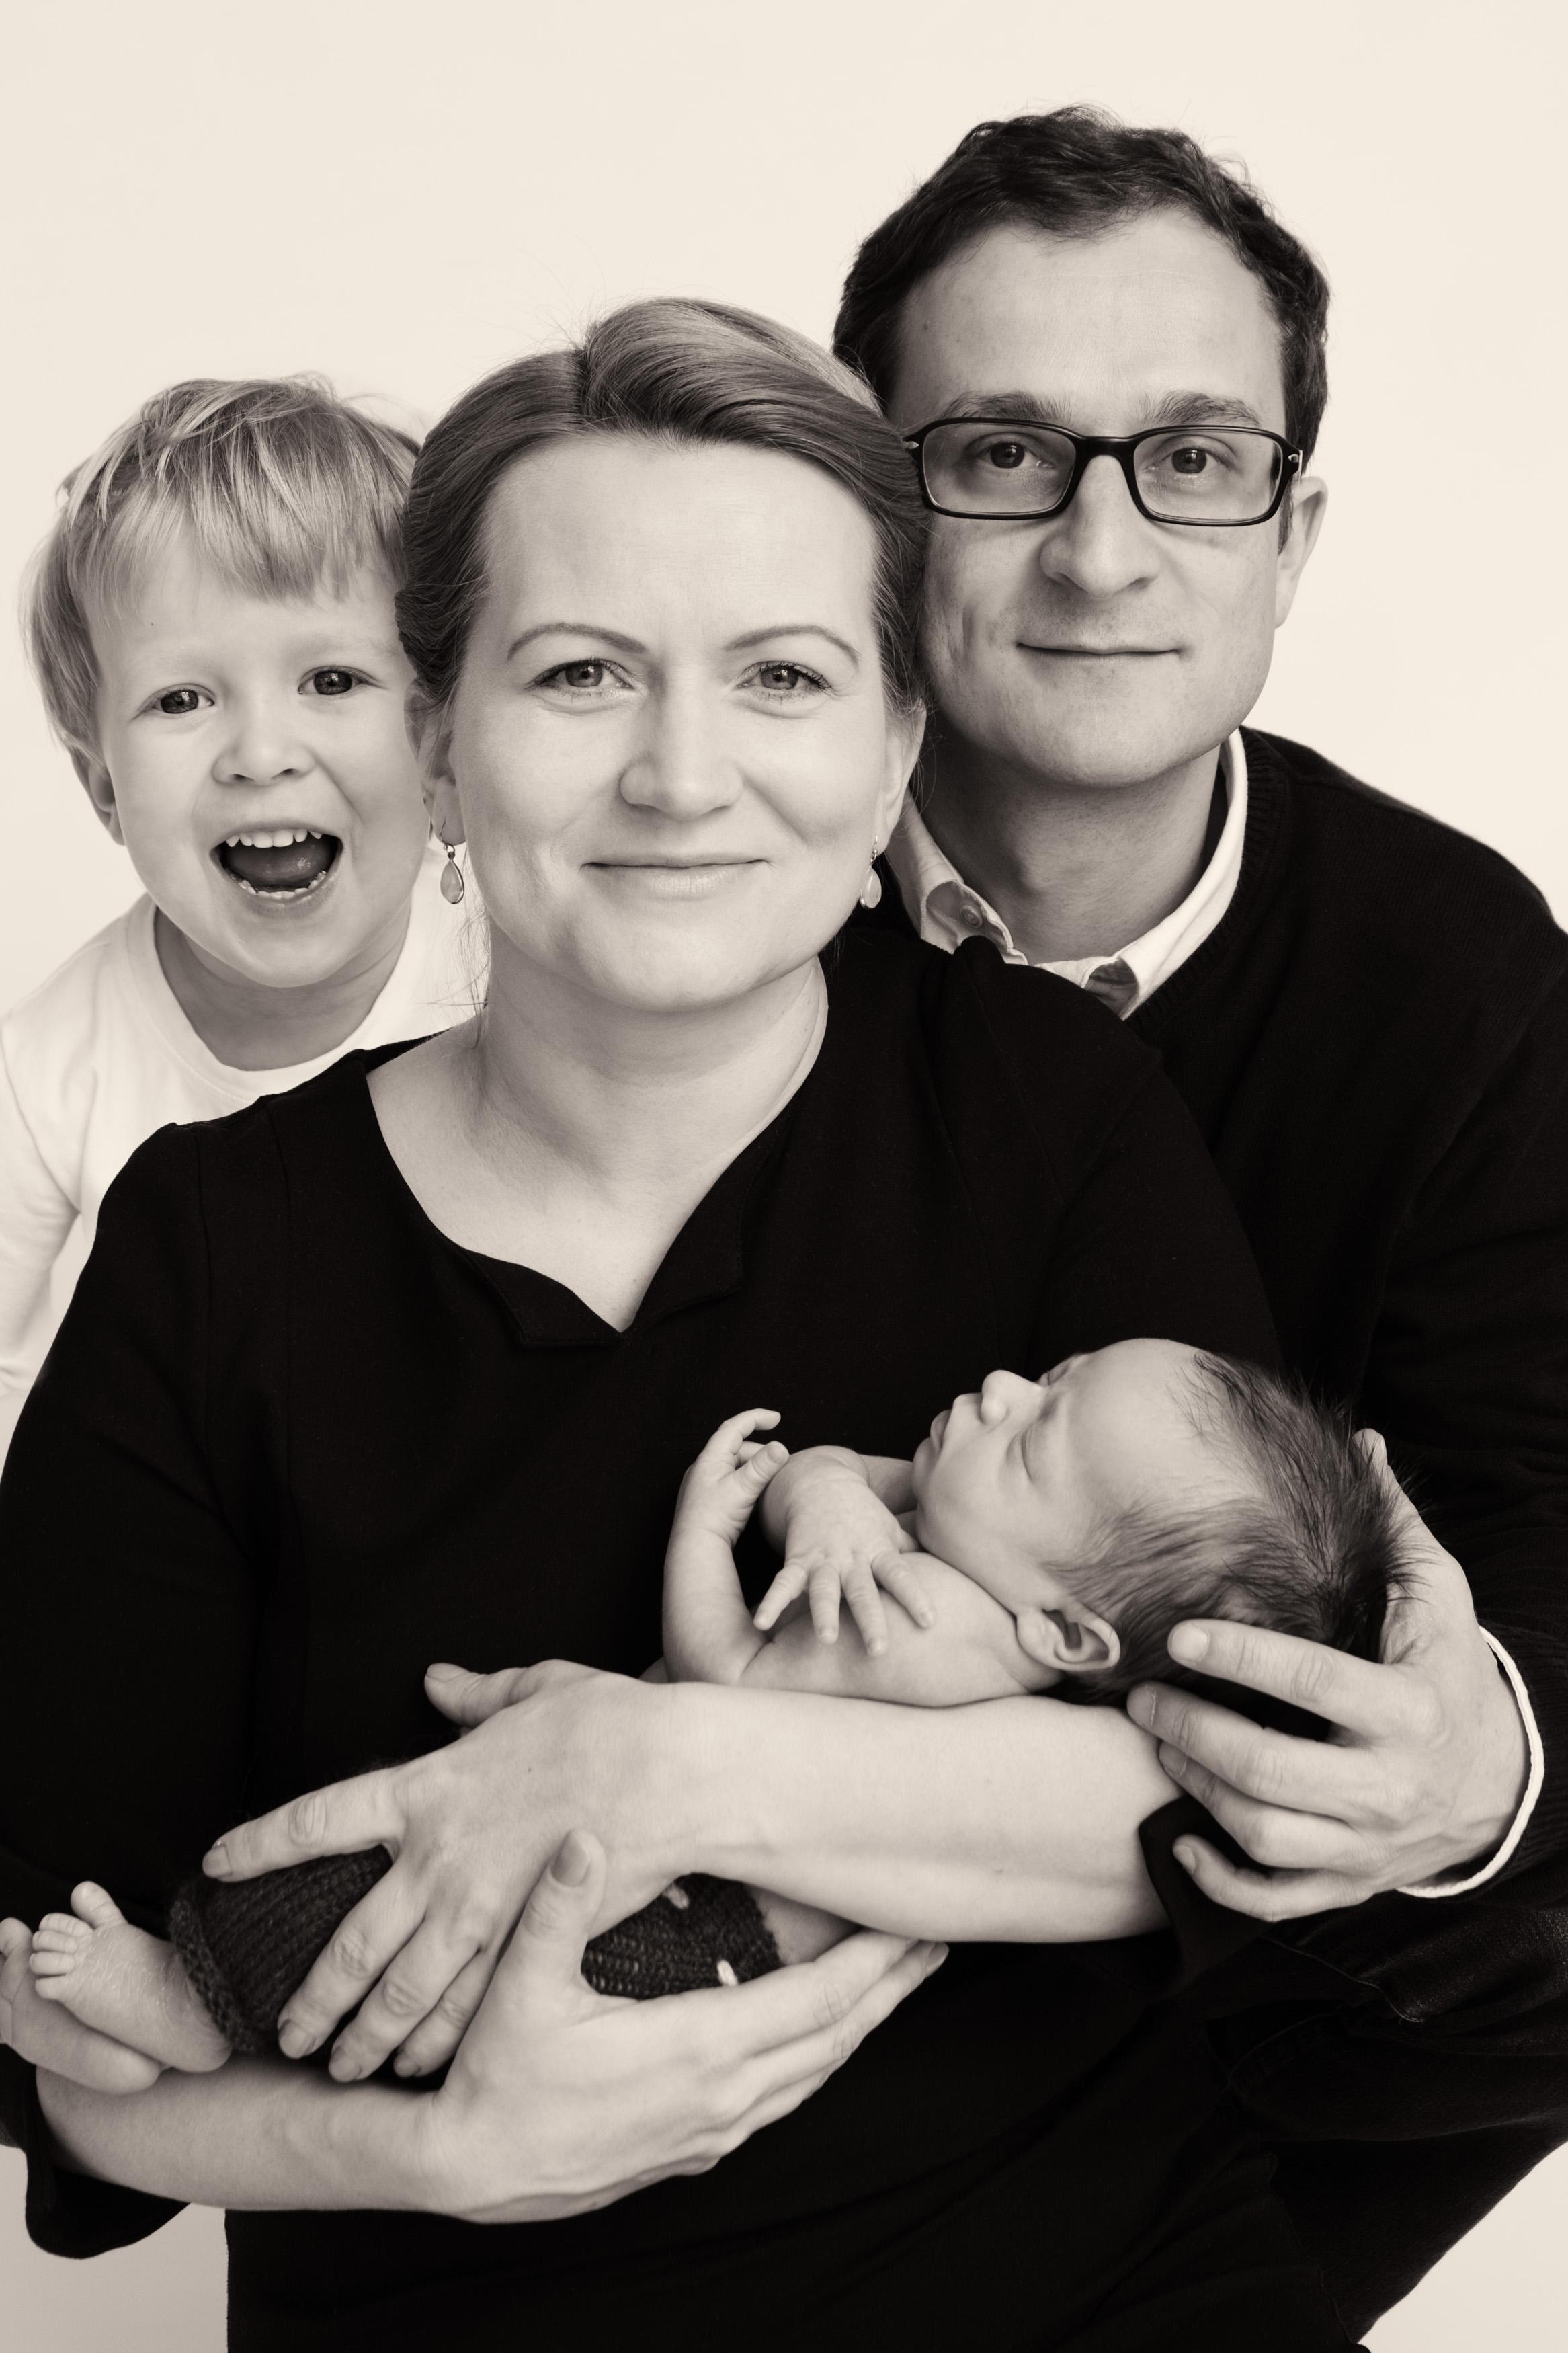 Home studio family portraits